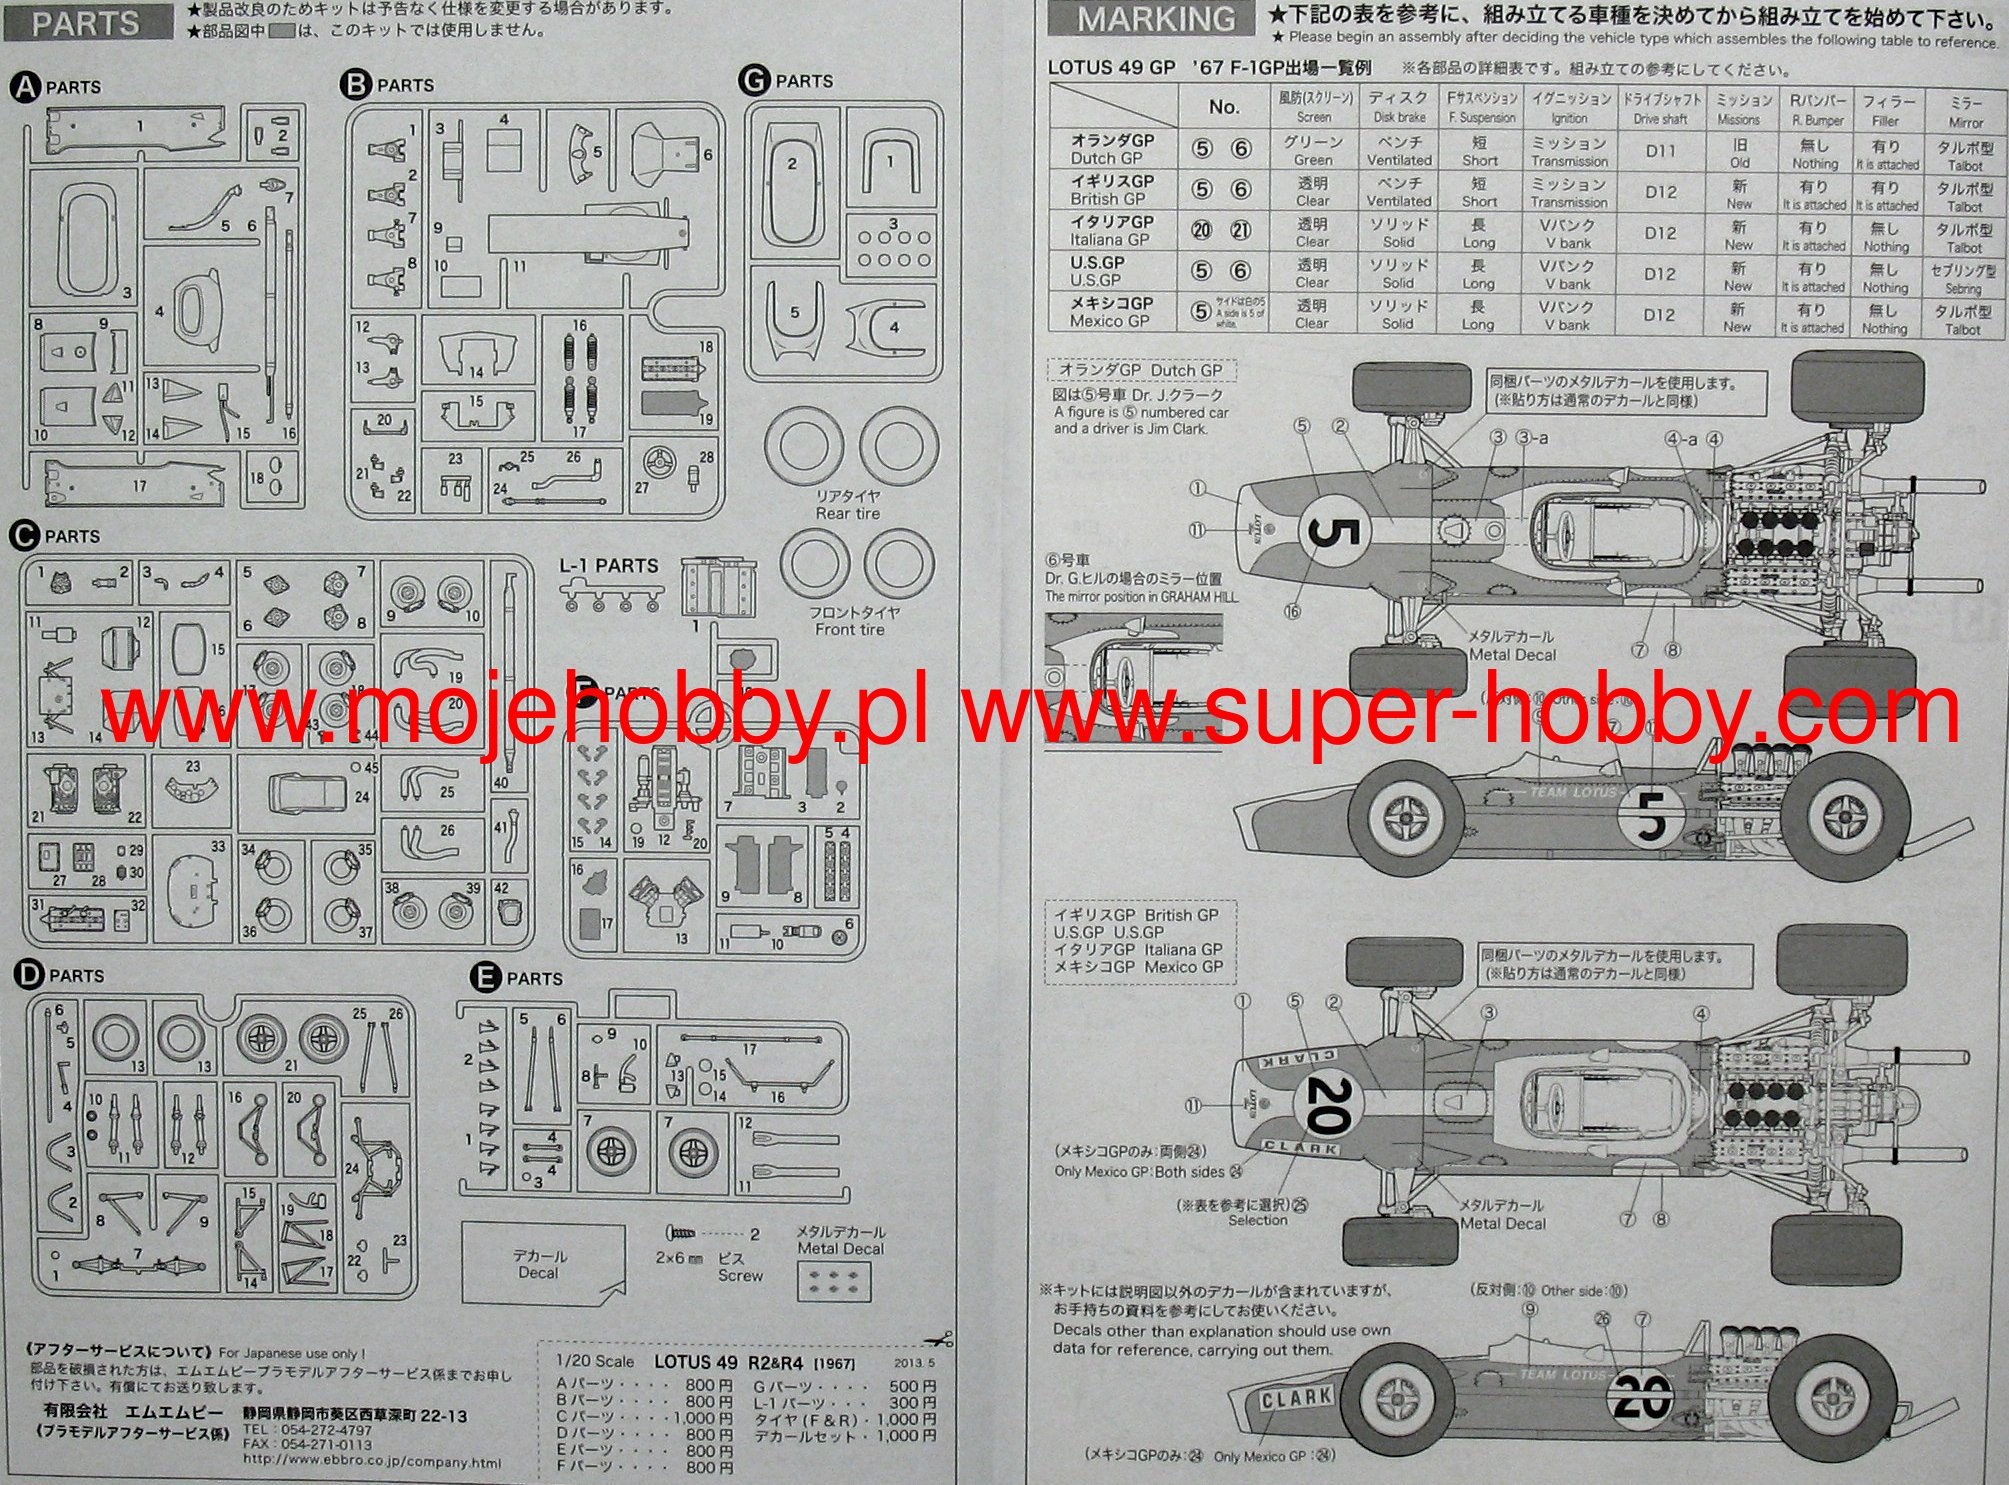 1967 team lotus wiring diagrams wiring diagram schemes. Black Bedroom Furniture Sets. Home Design Ideas